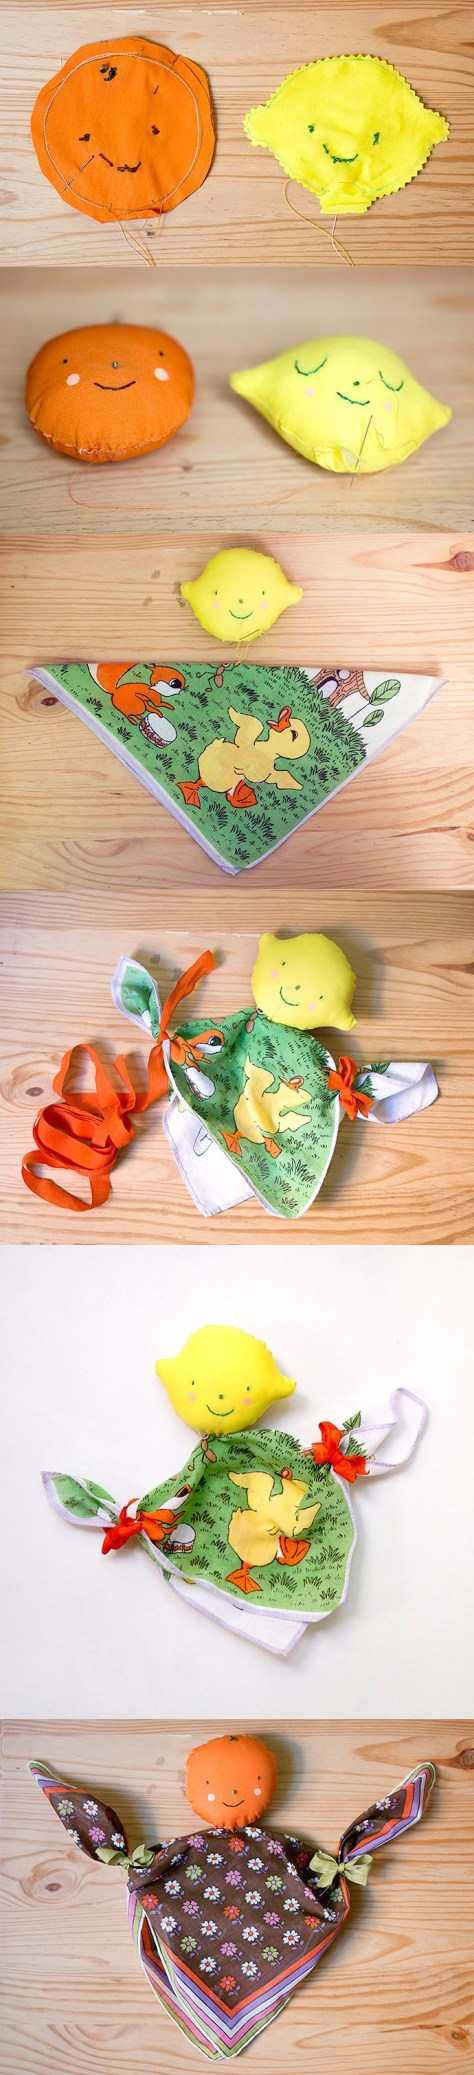 DIY Handkerchief Dolls